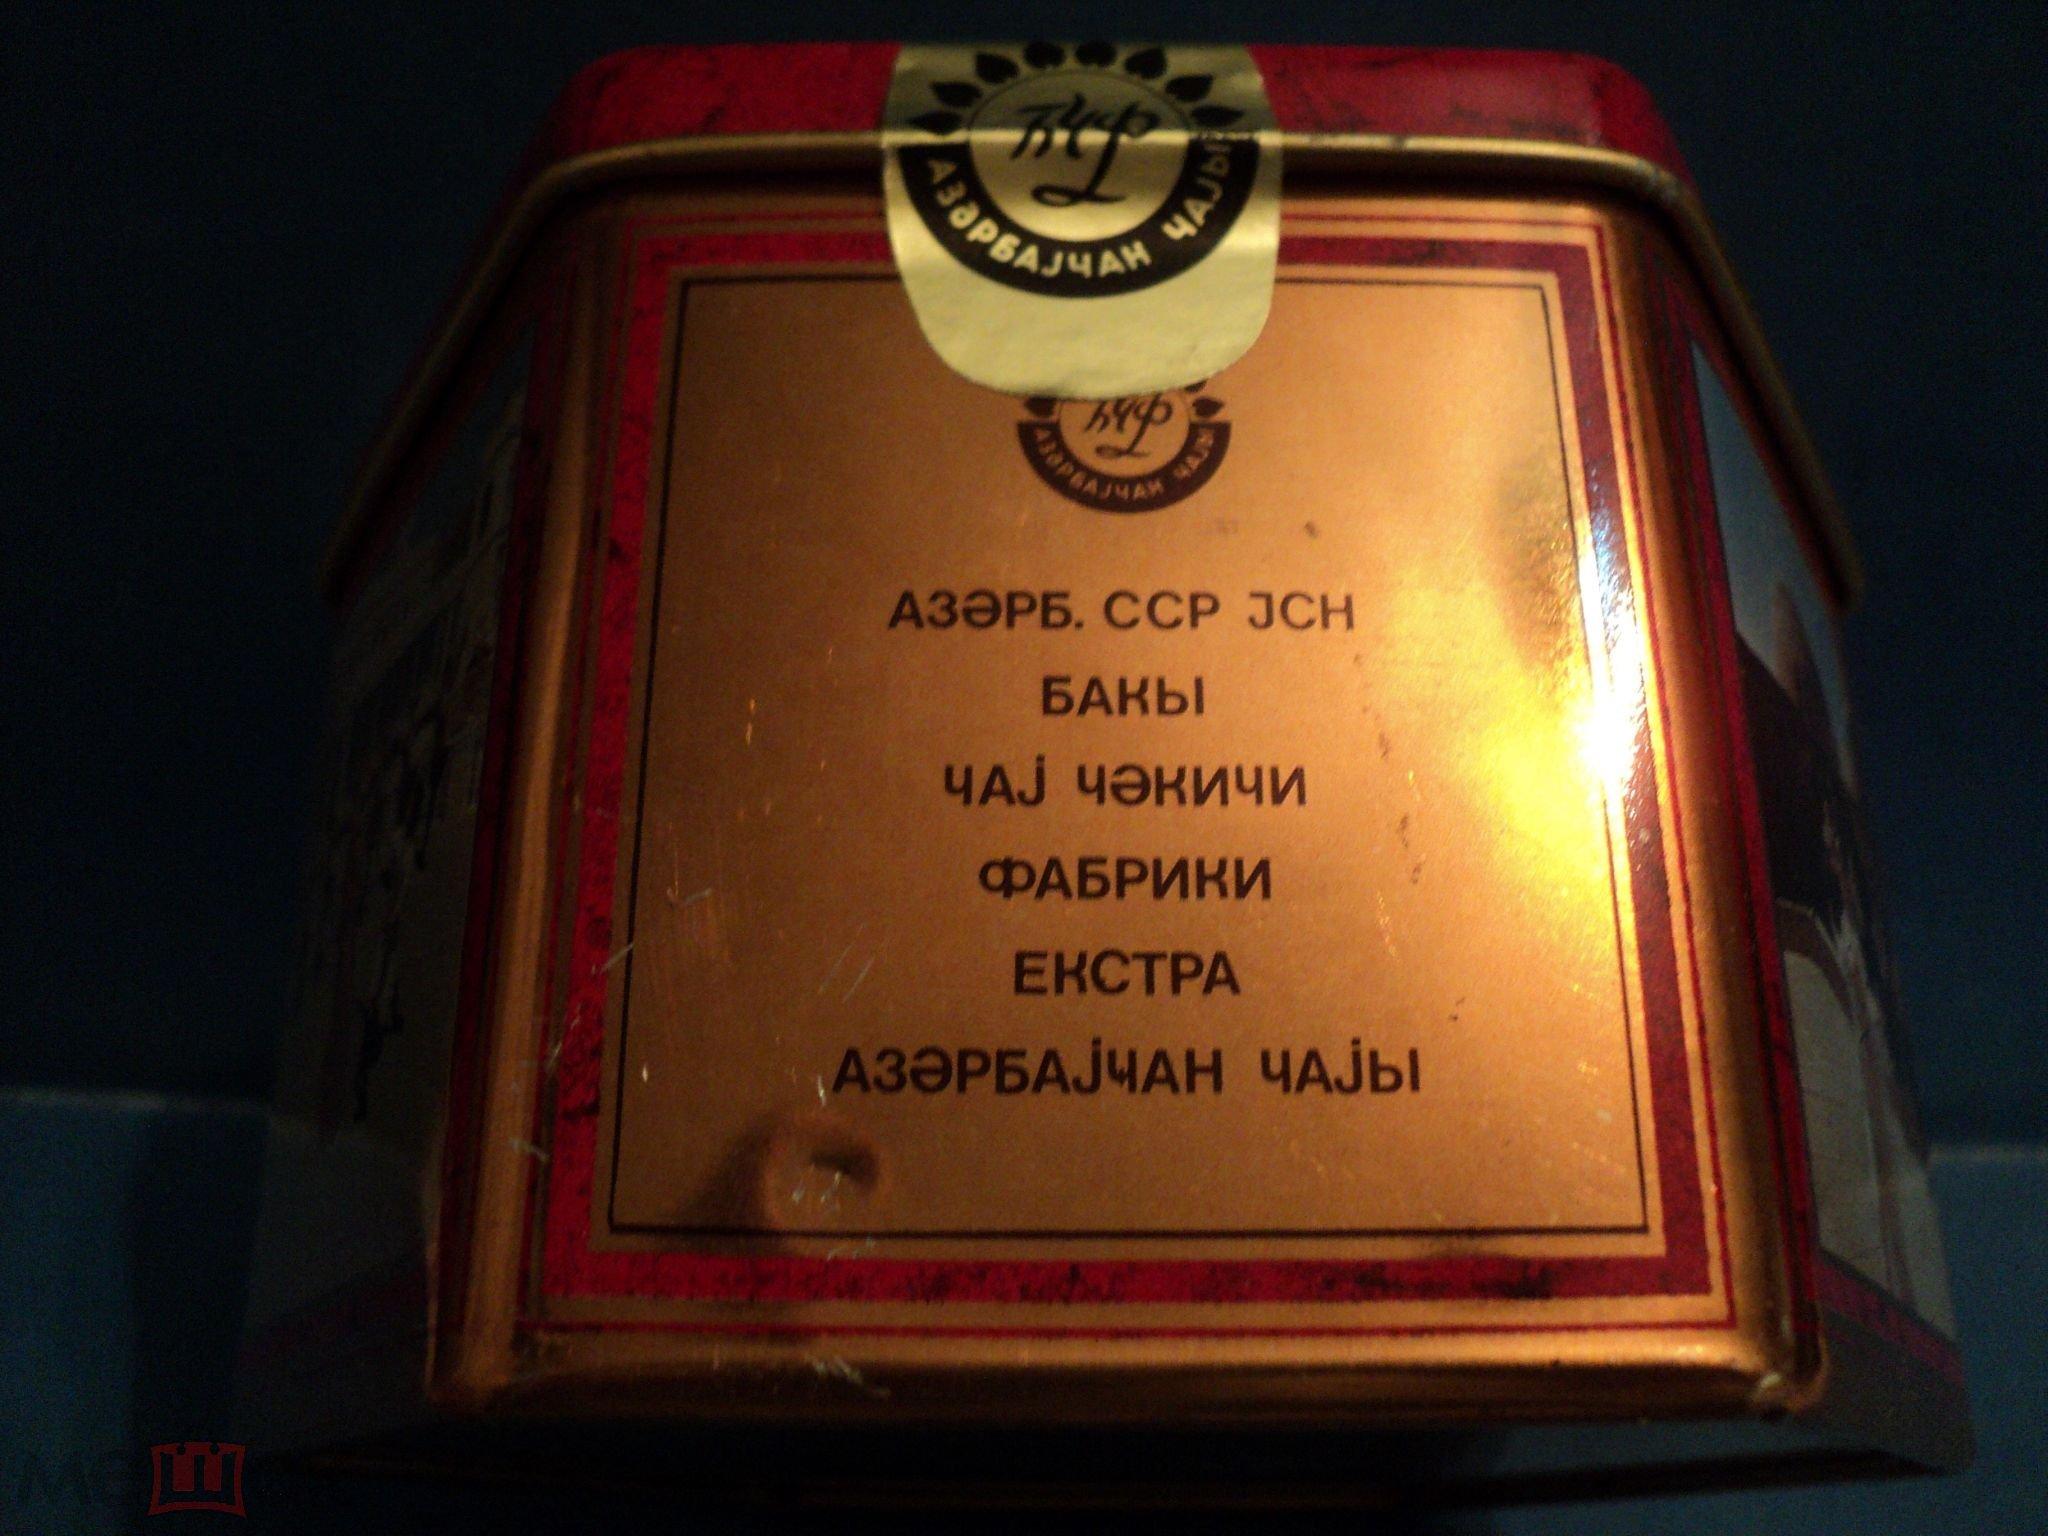 Как на азерюайджансклм целую